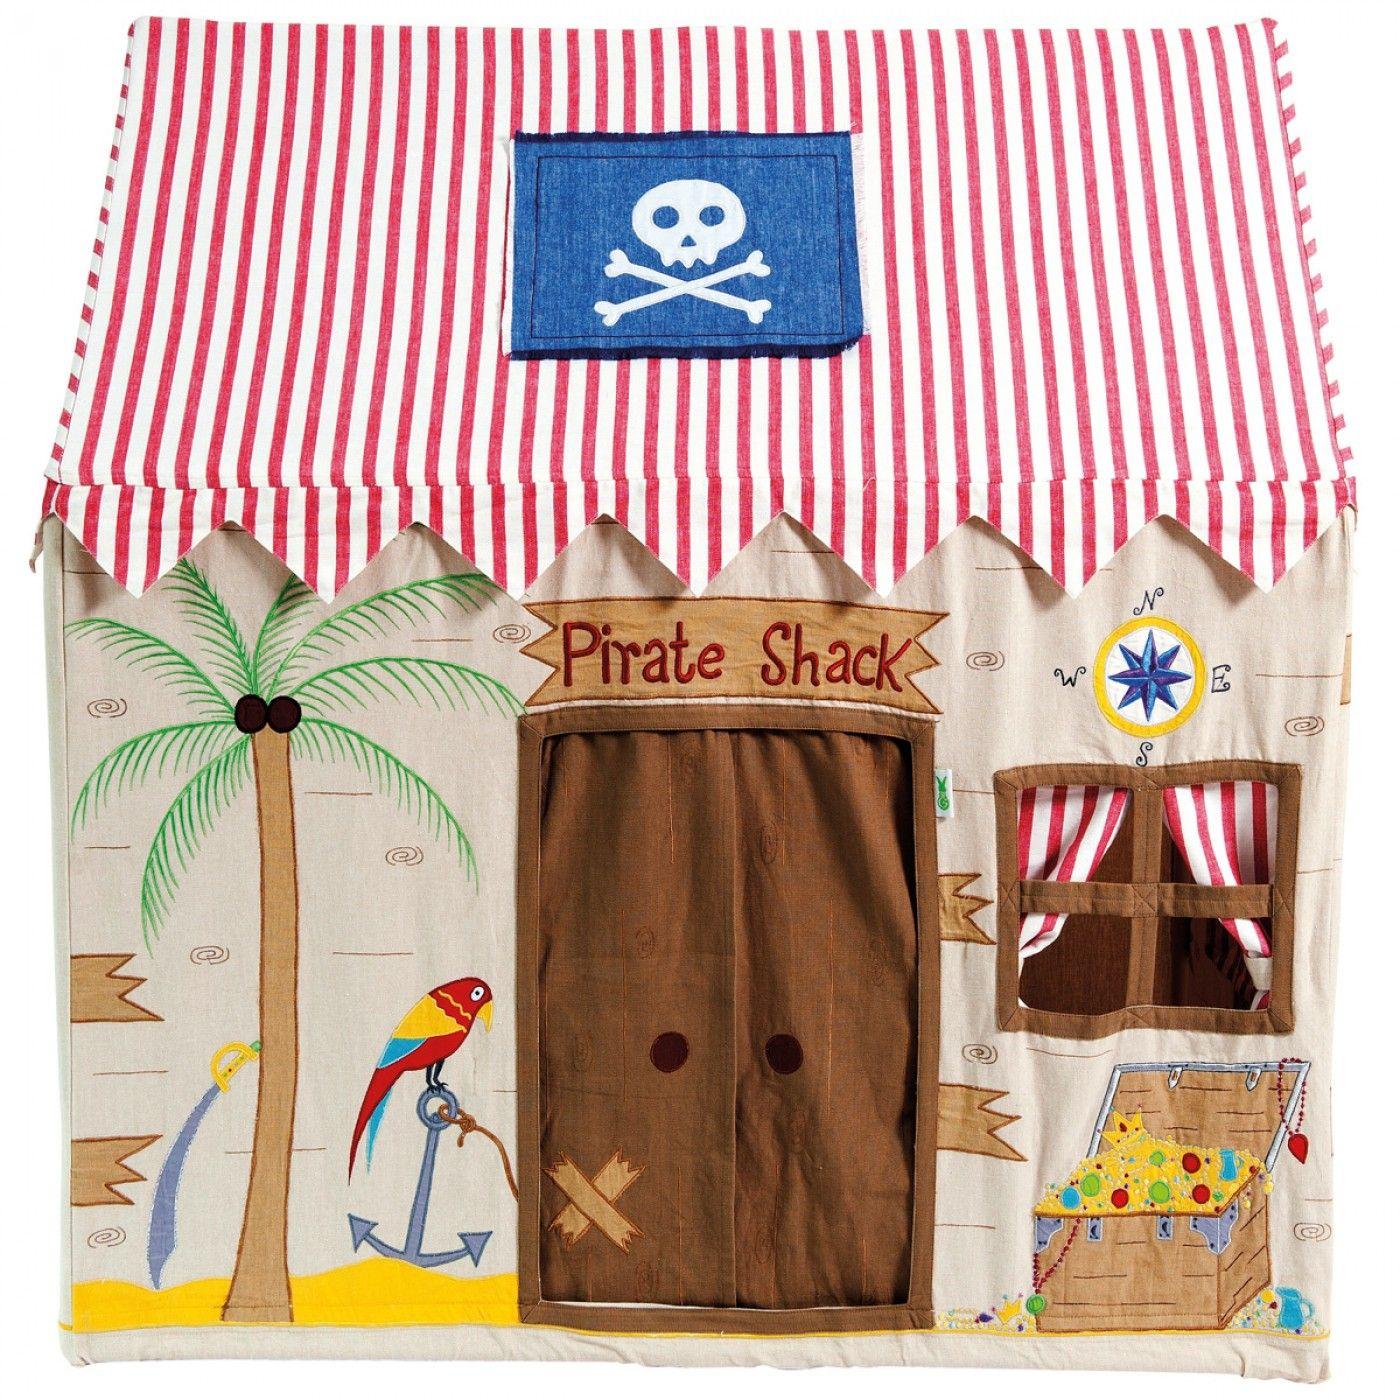 Pirate Shack Playhouse  sc 1 st  Pinterest & Pirate Shack Playhouse | TOYS | Pinterest | Playhouses Indoor ...